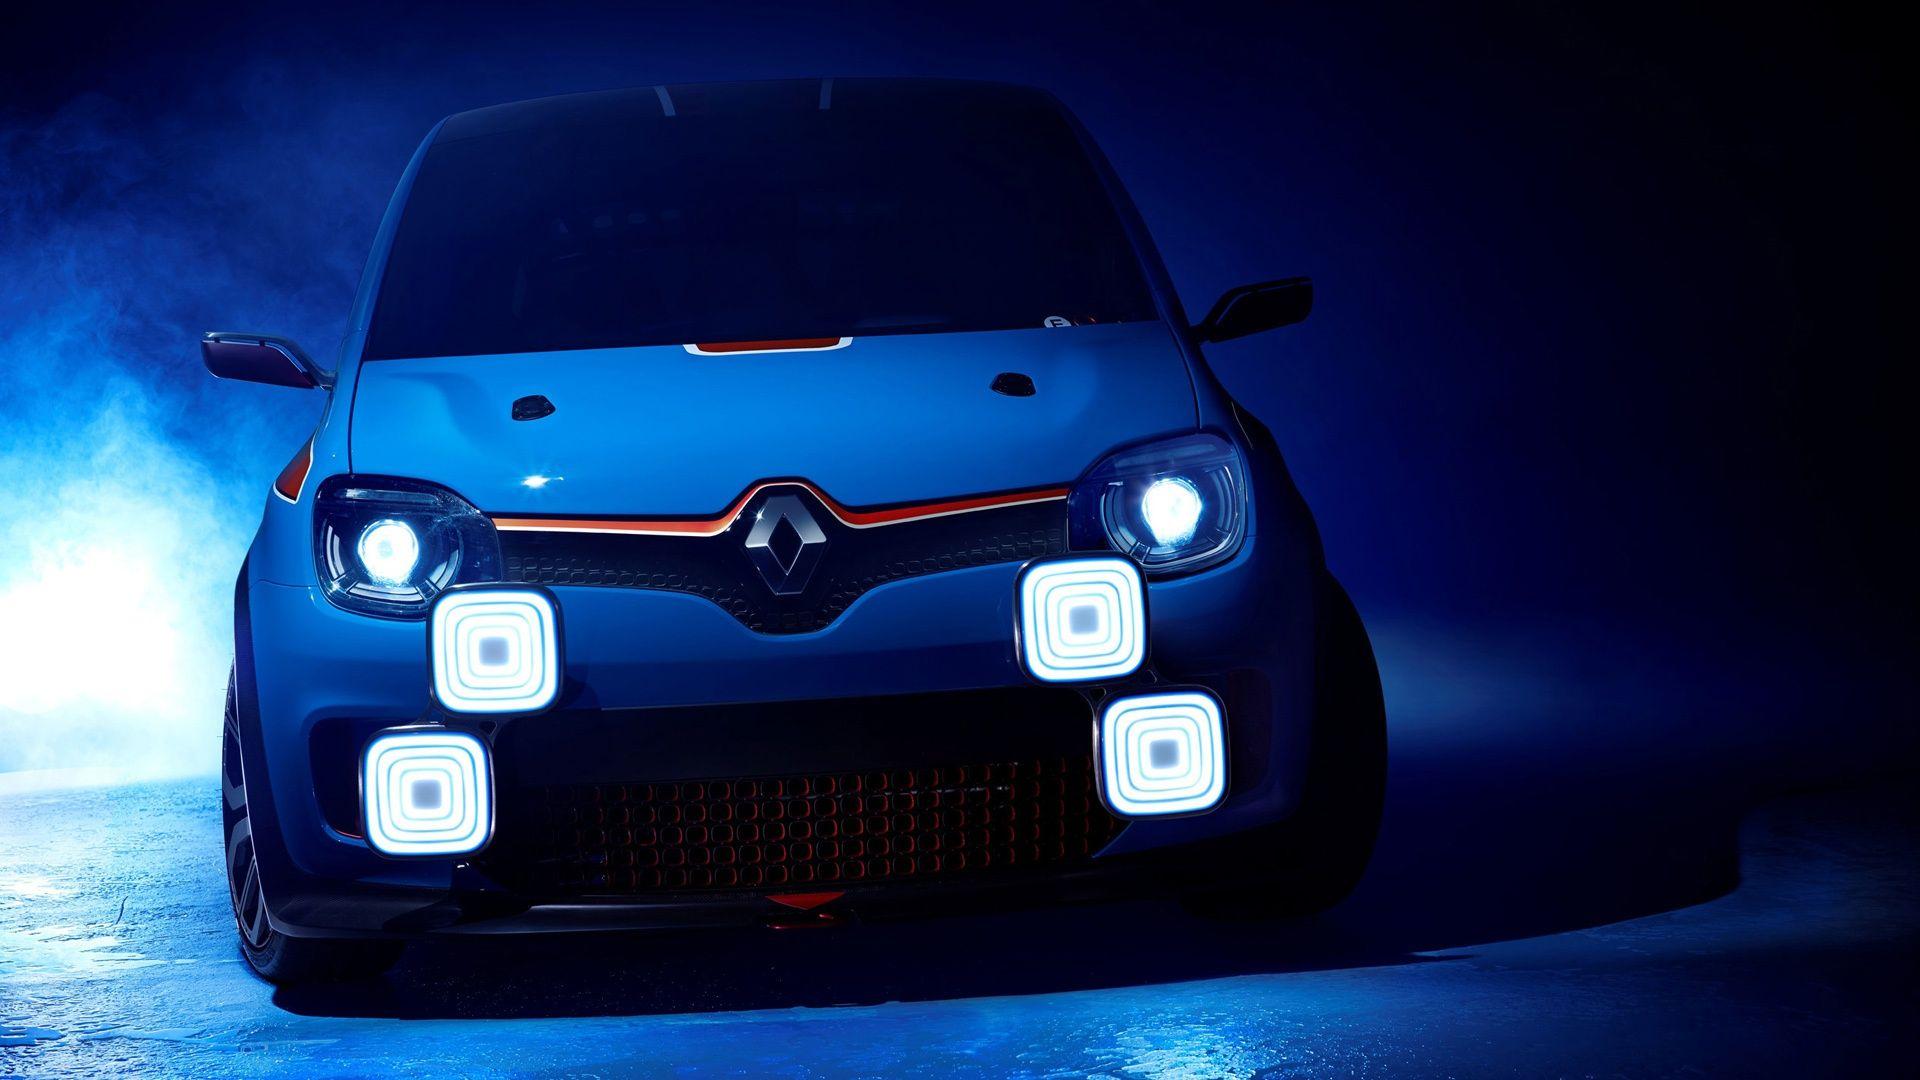 Blue renault twin run concept Cheap sports cars, Concept